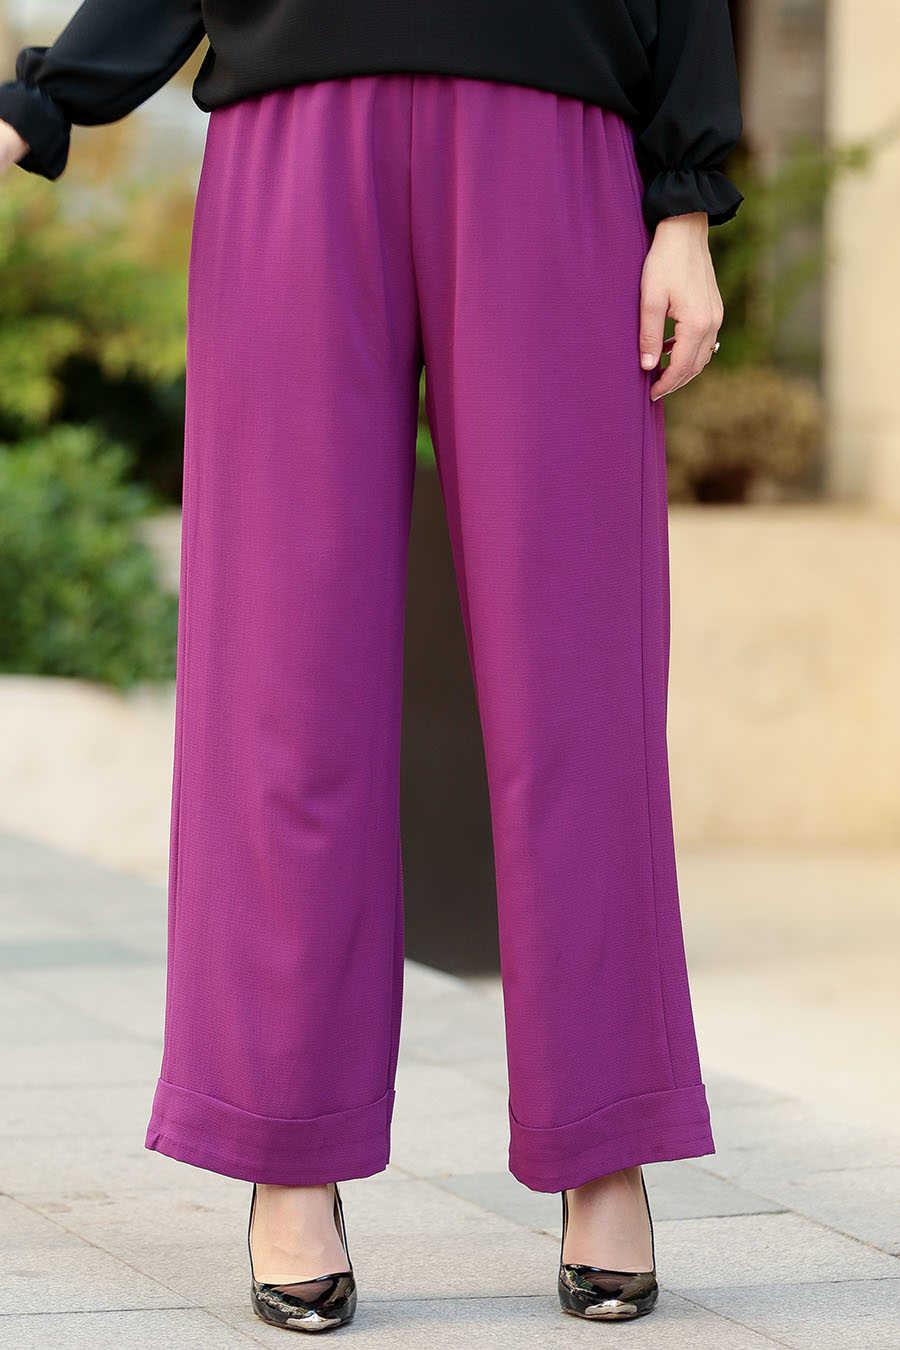 Neva Style - Plum Color Hijab Pants 8122MU